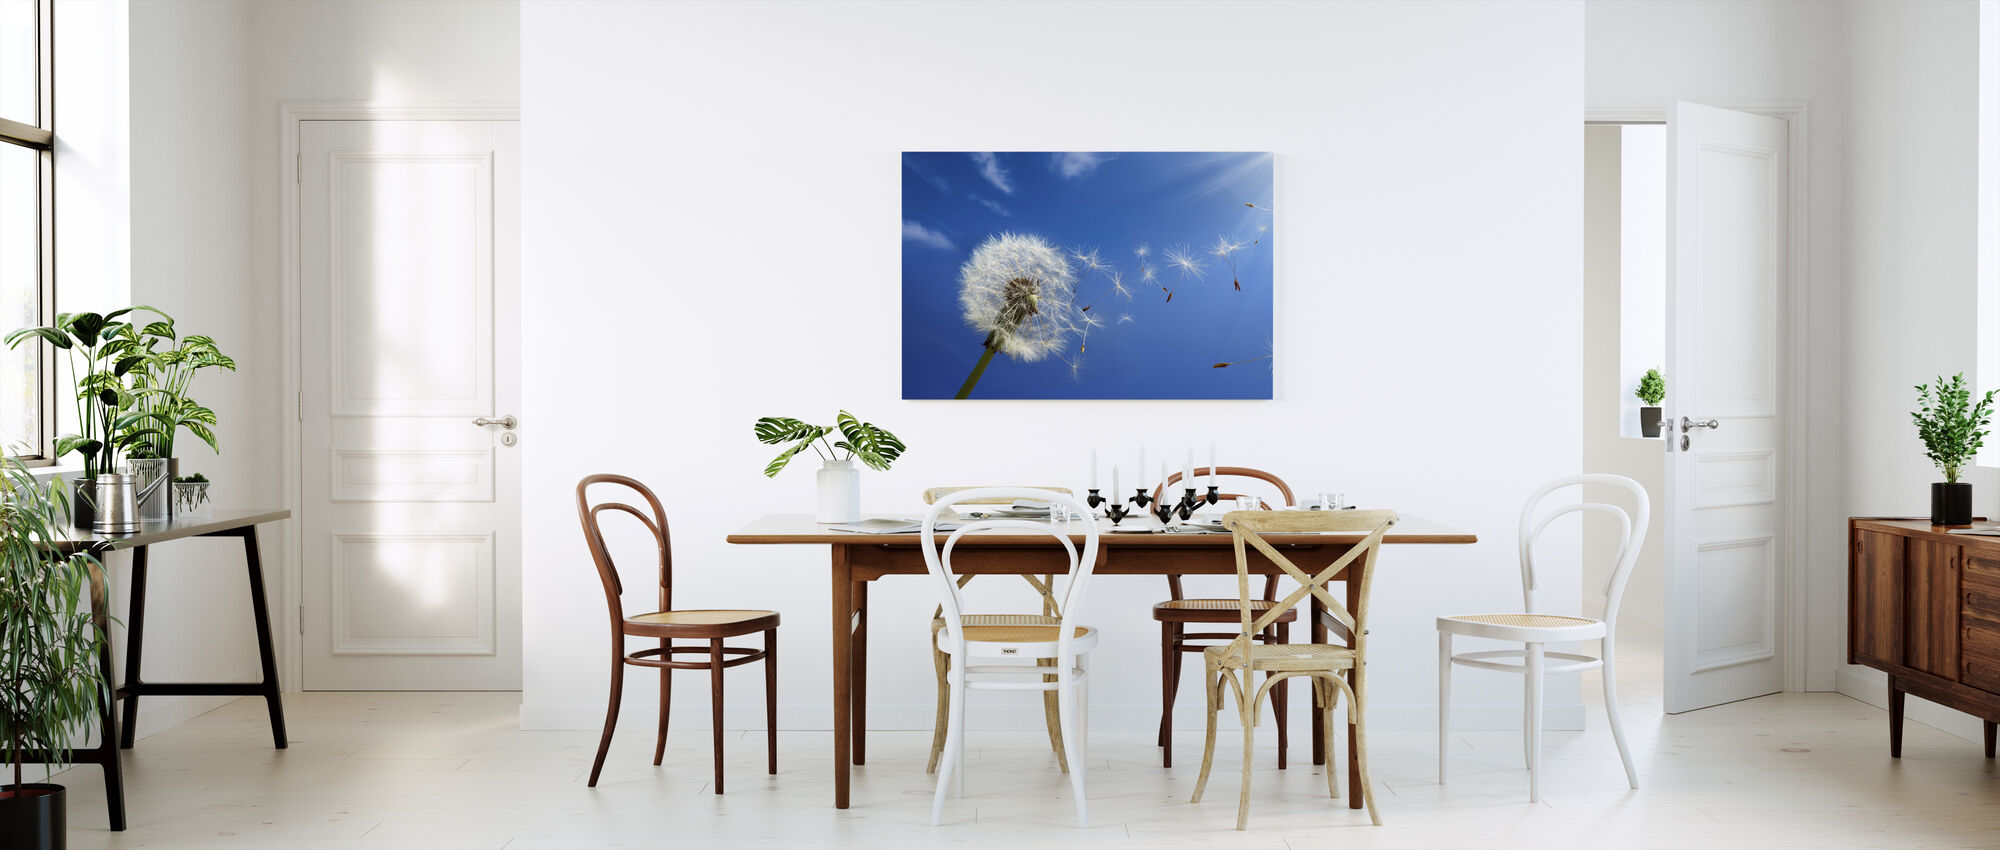 Dreams of Dandelion - Canvas print - Kitchen